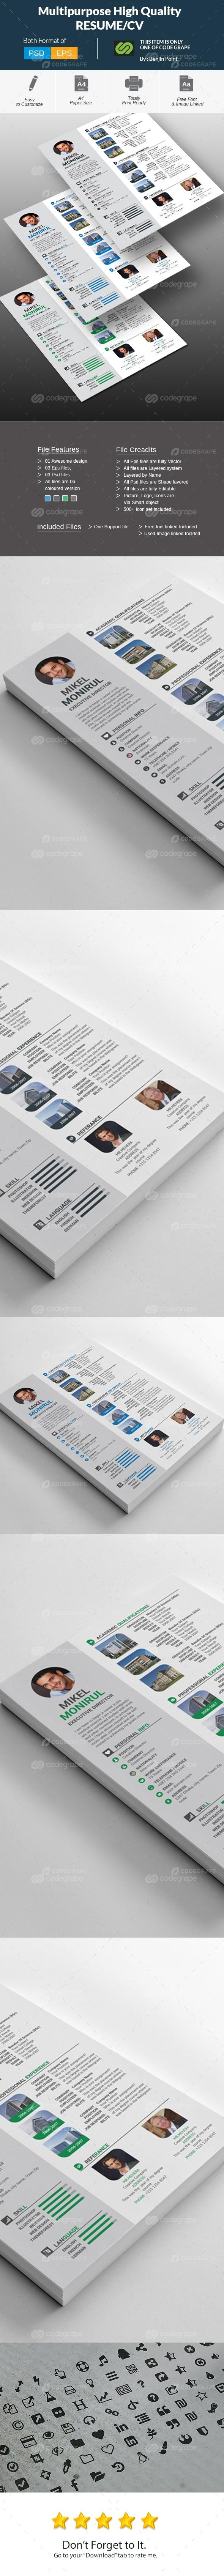 Multipurpose High Quality Resume/Cv